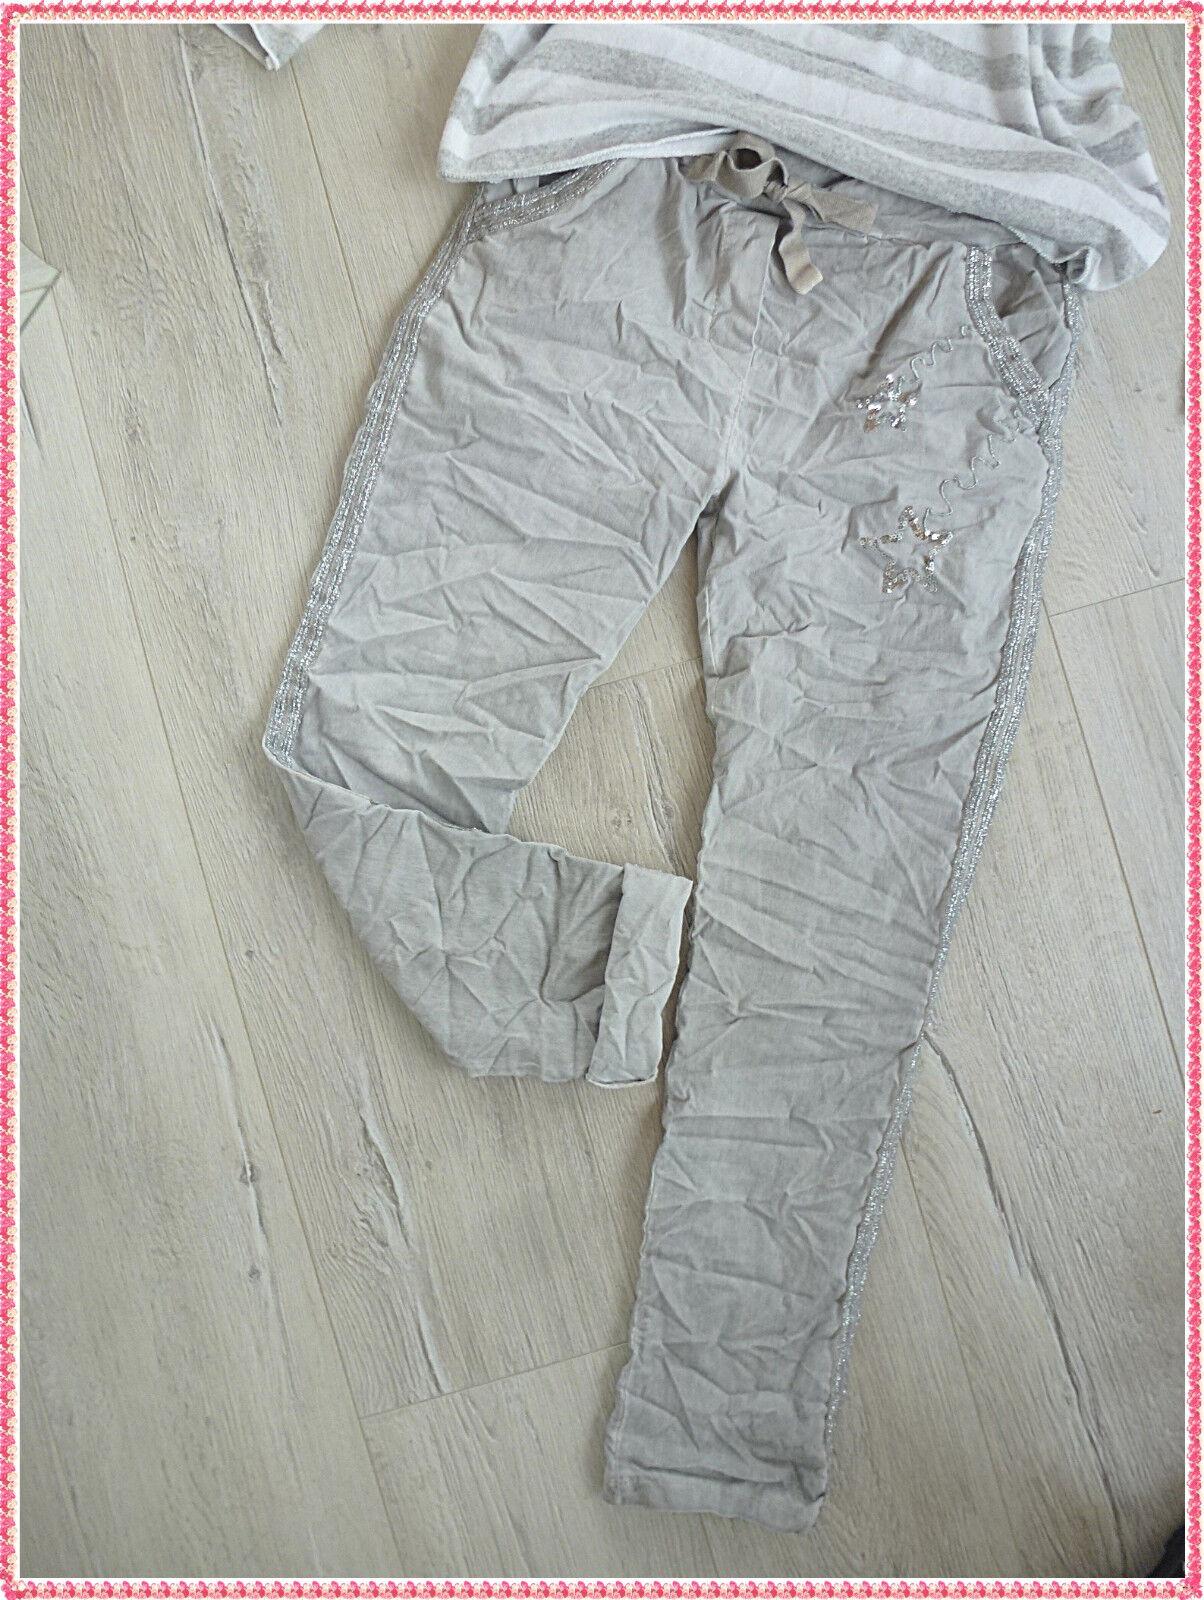 36 38 38 38 40 Hose Jogpant baggy Silber Streifen Pailletten Sterne grau